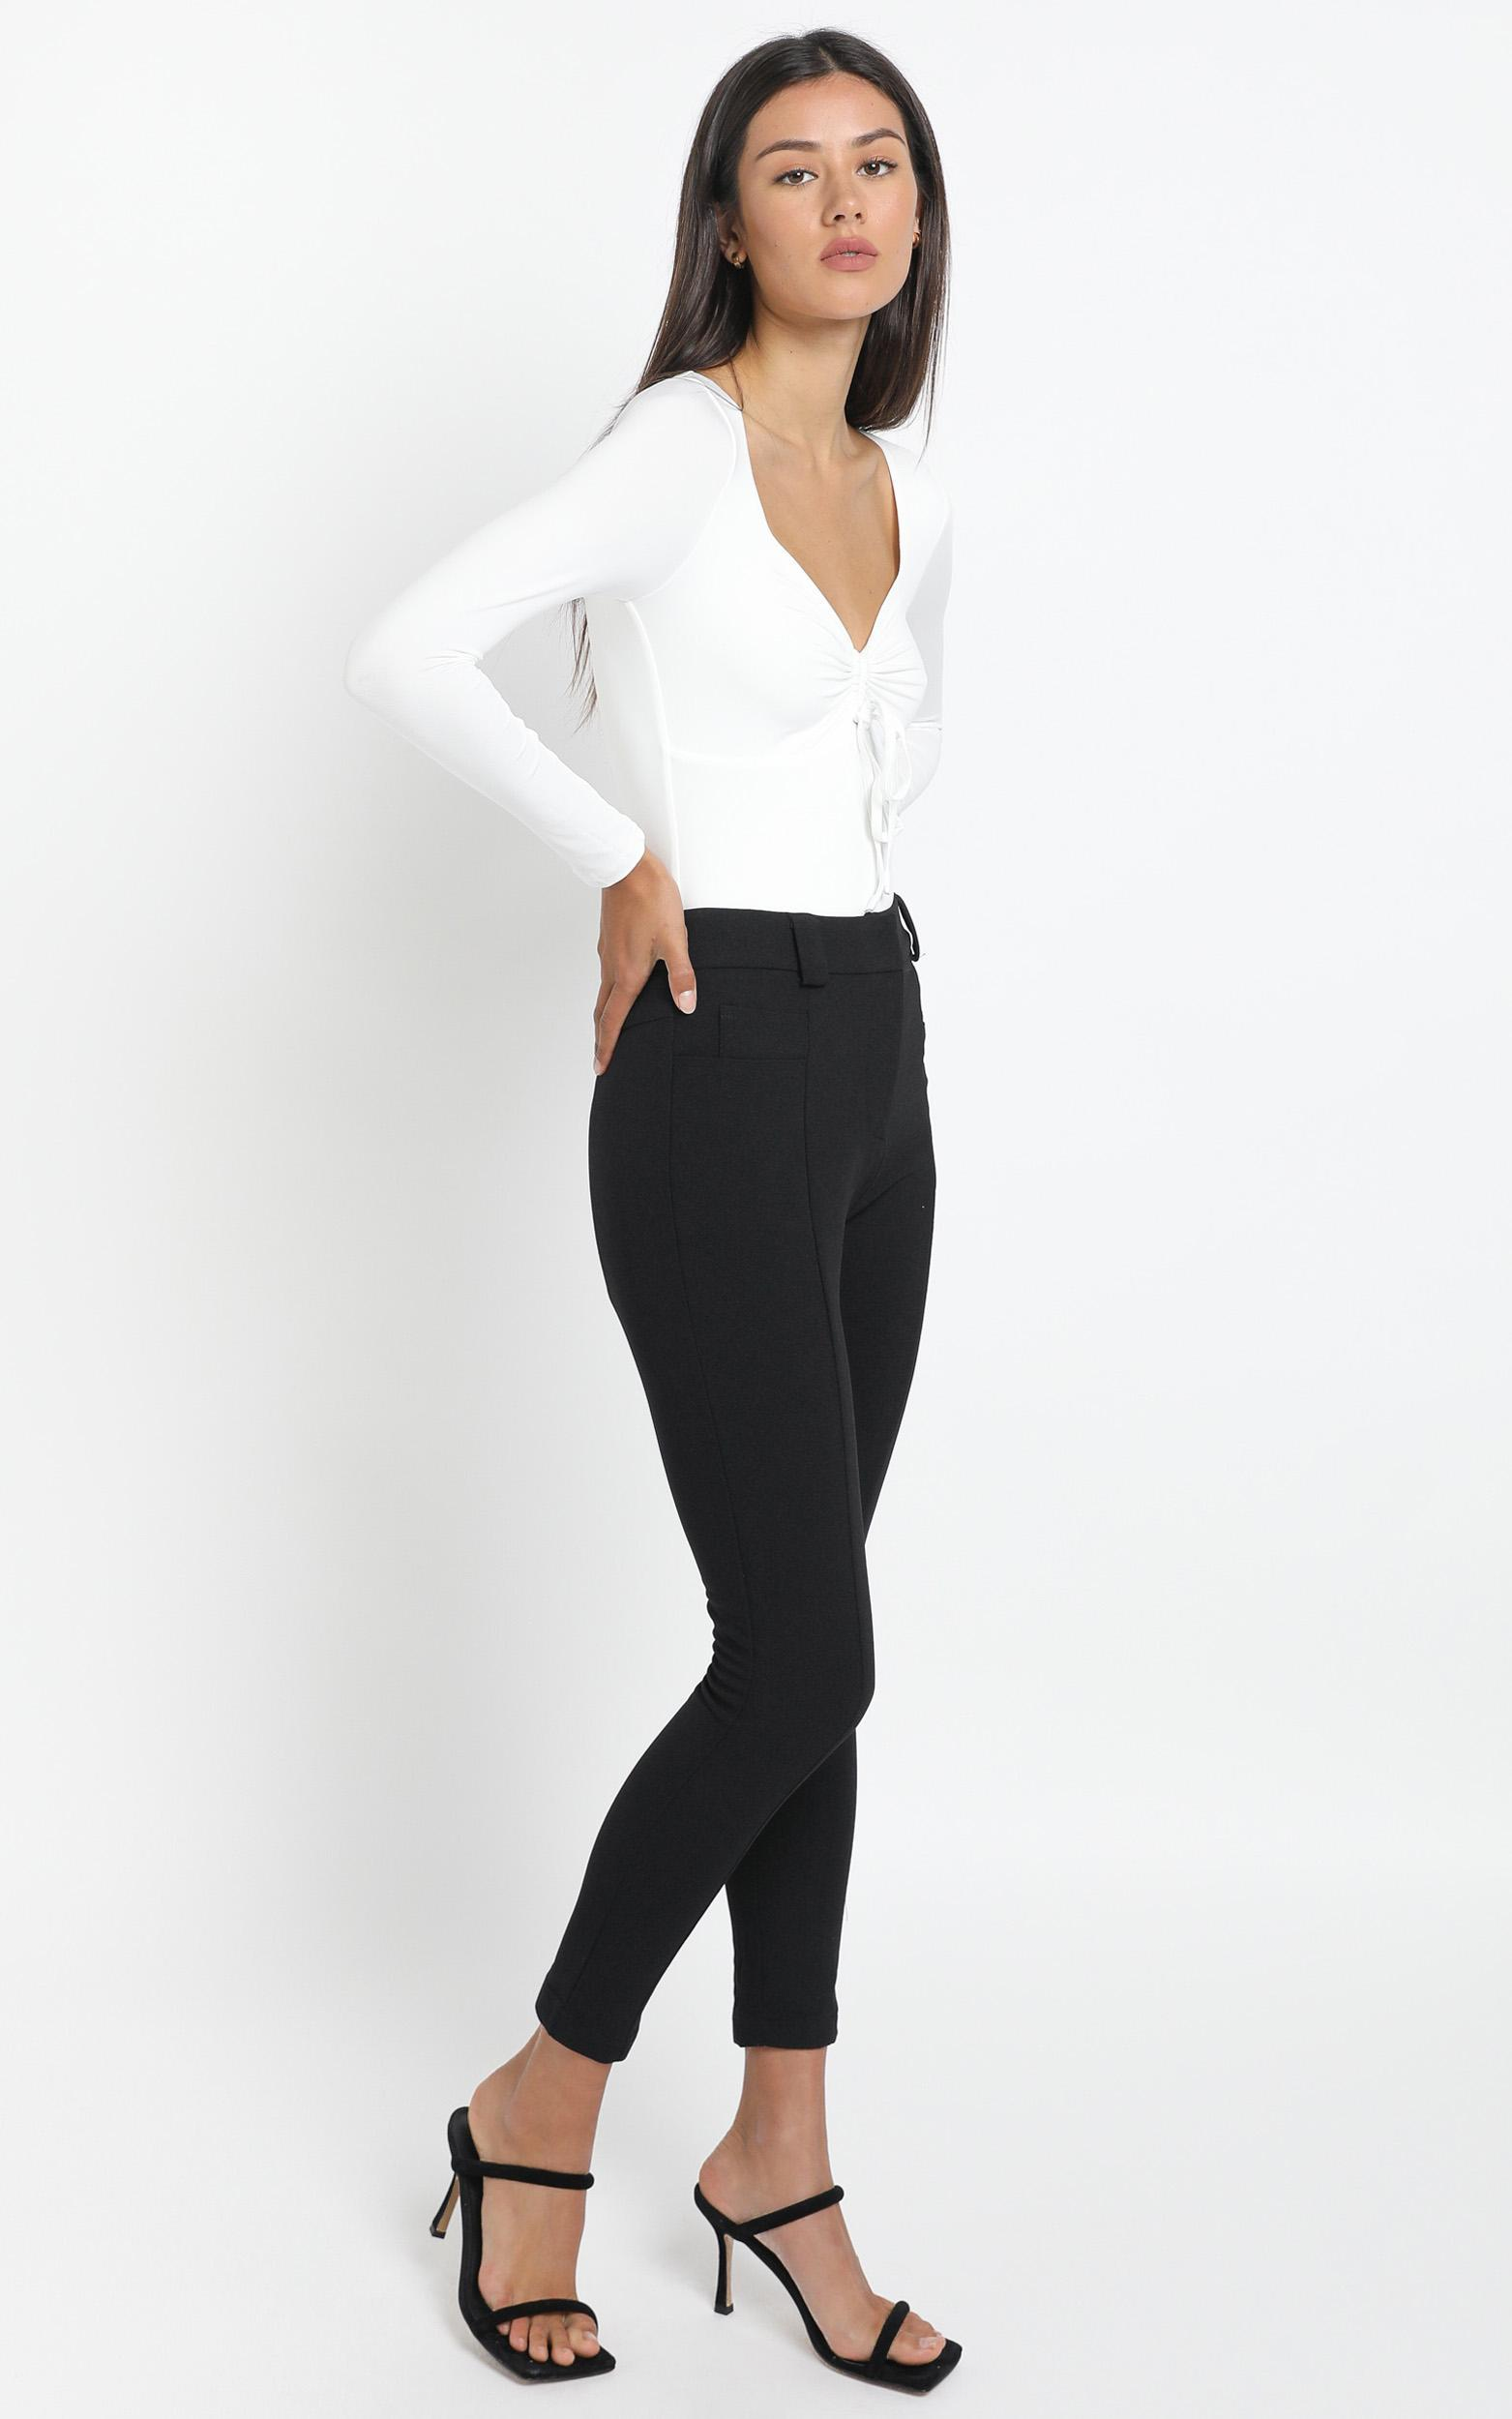 Iris Pants in Black - 14 (XL), BLK1, hi-res image number null